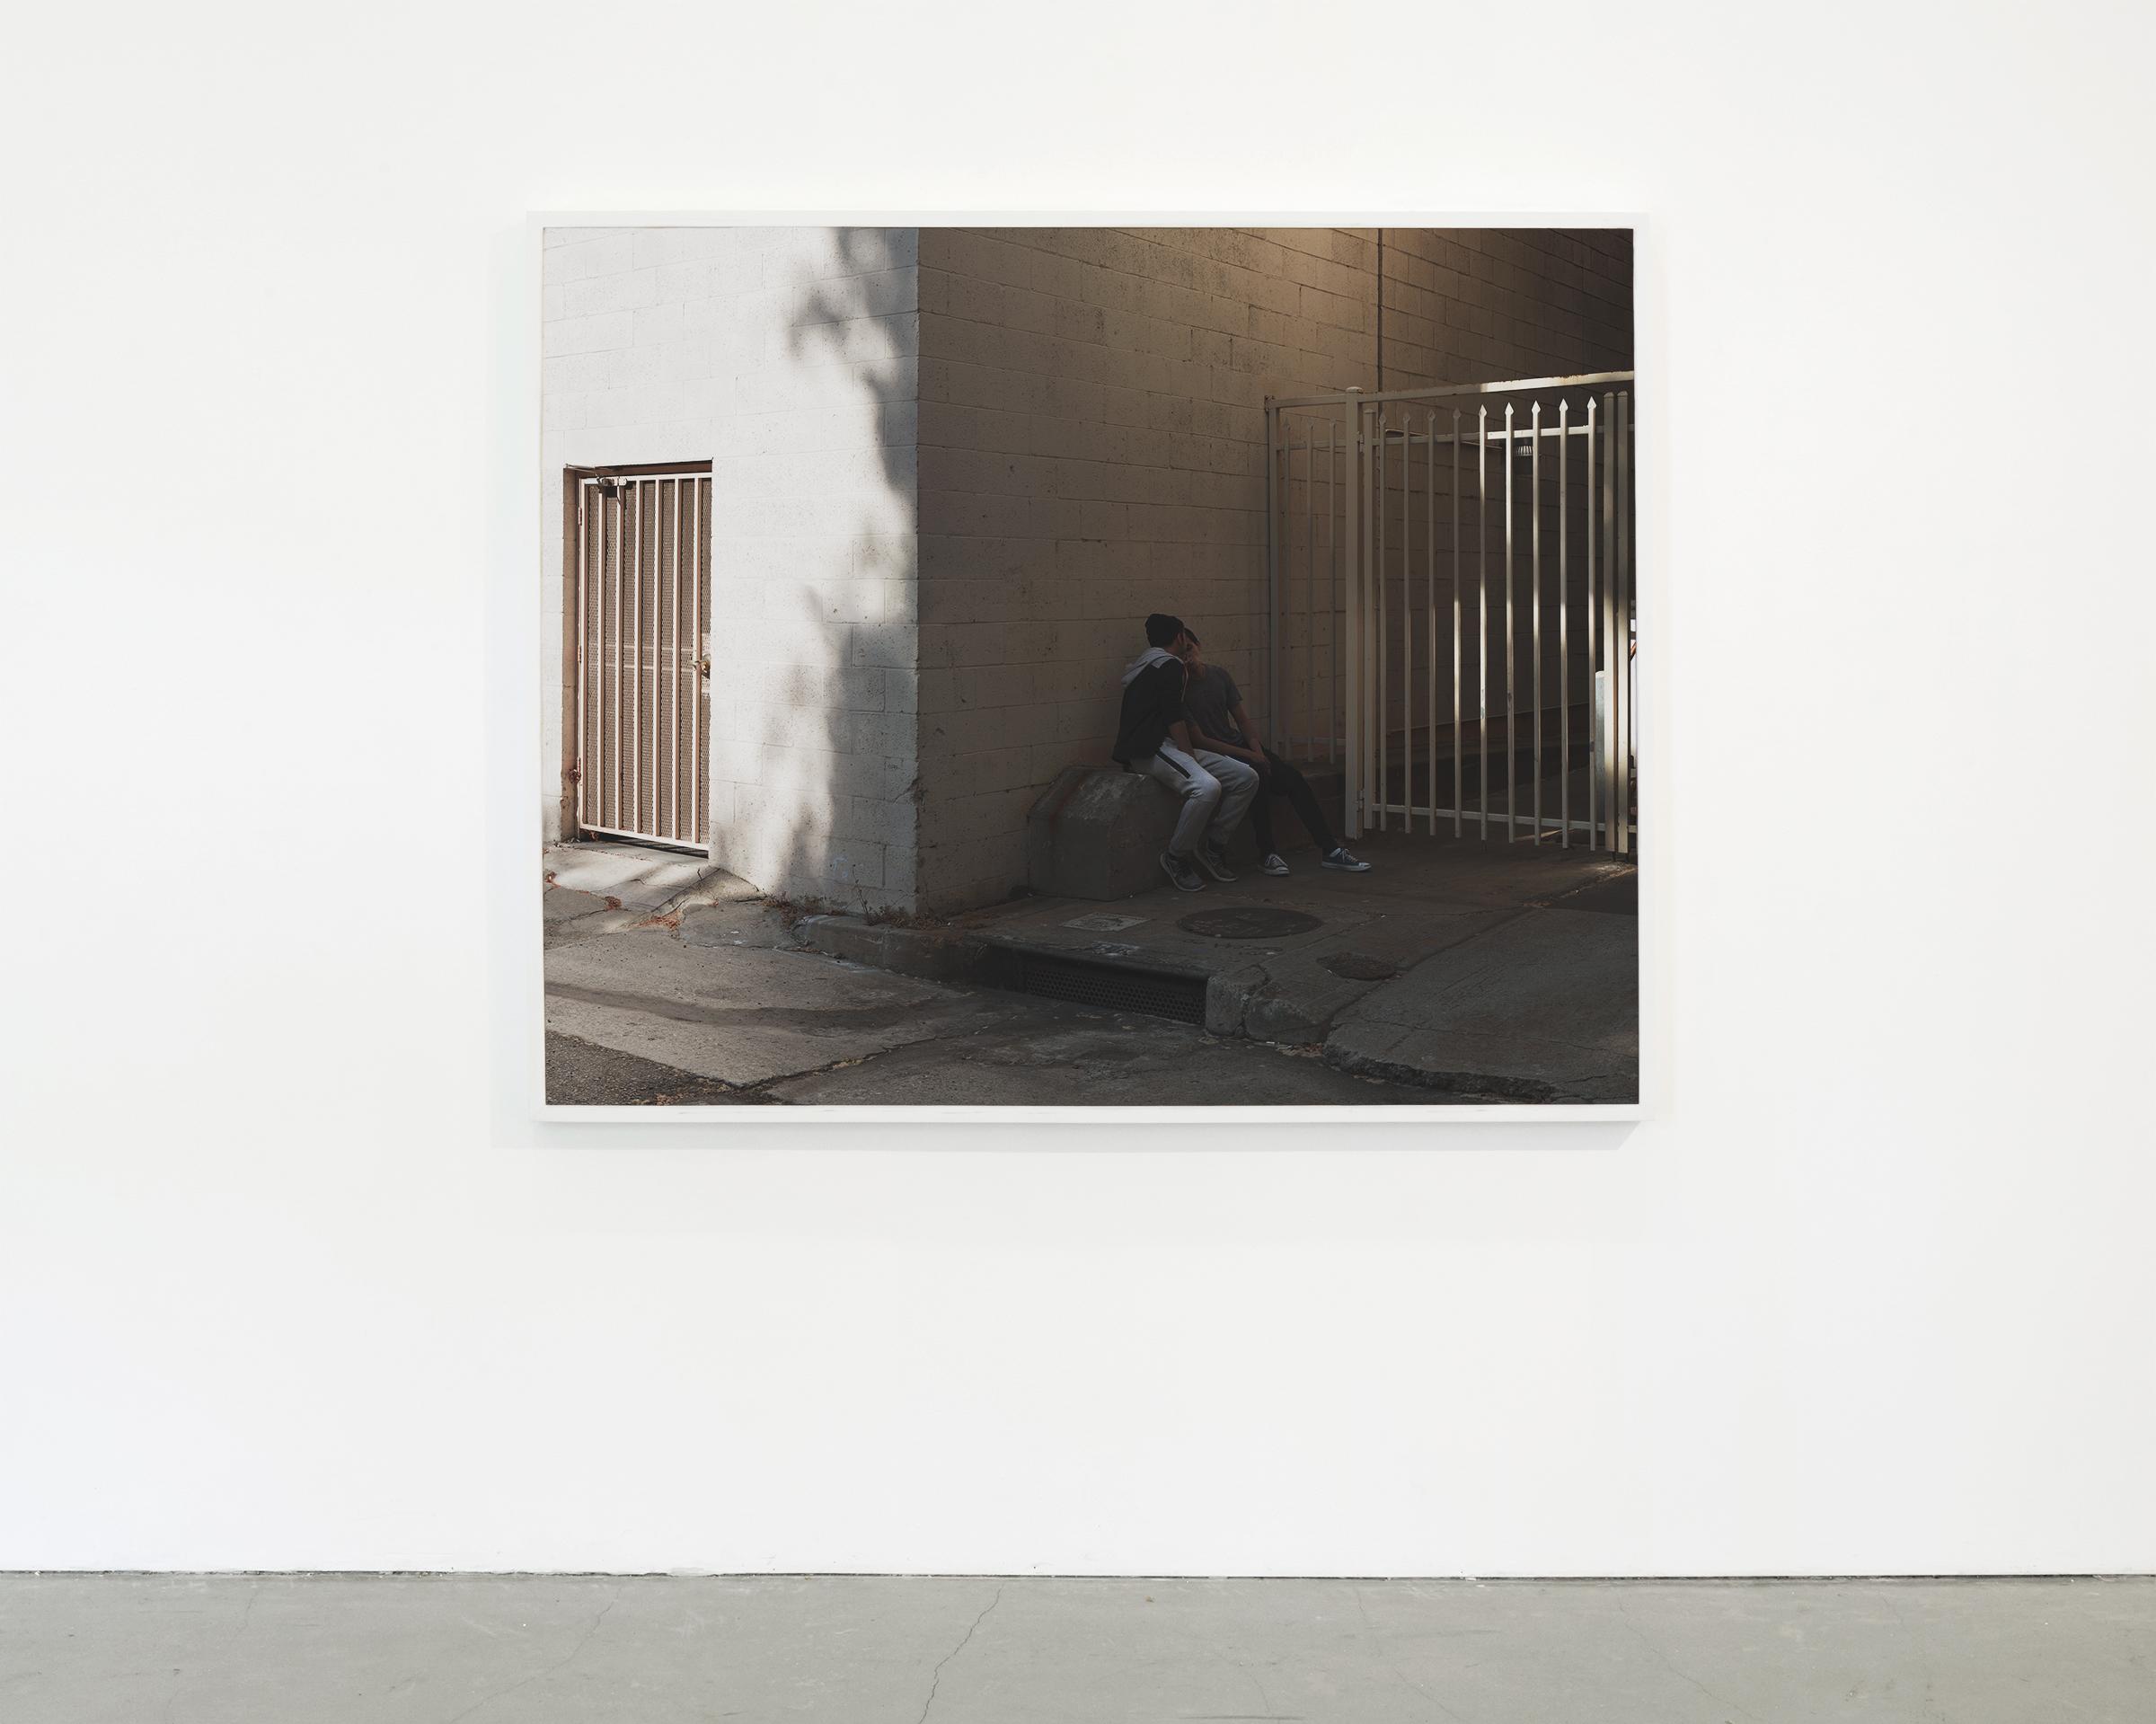 """Corners"", 2017 - 2018  54 x 67.50 in. (137.15 x 171.45 cm)"